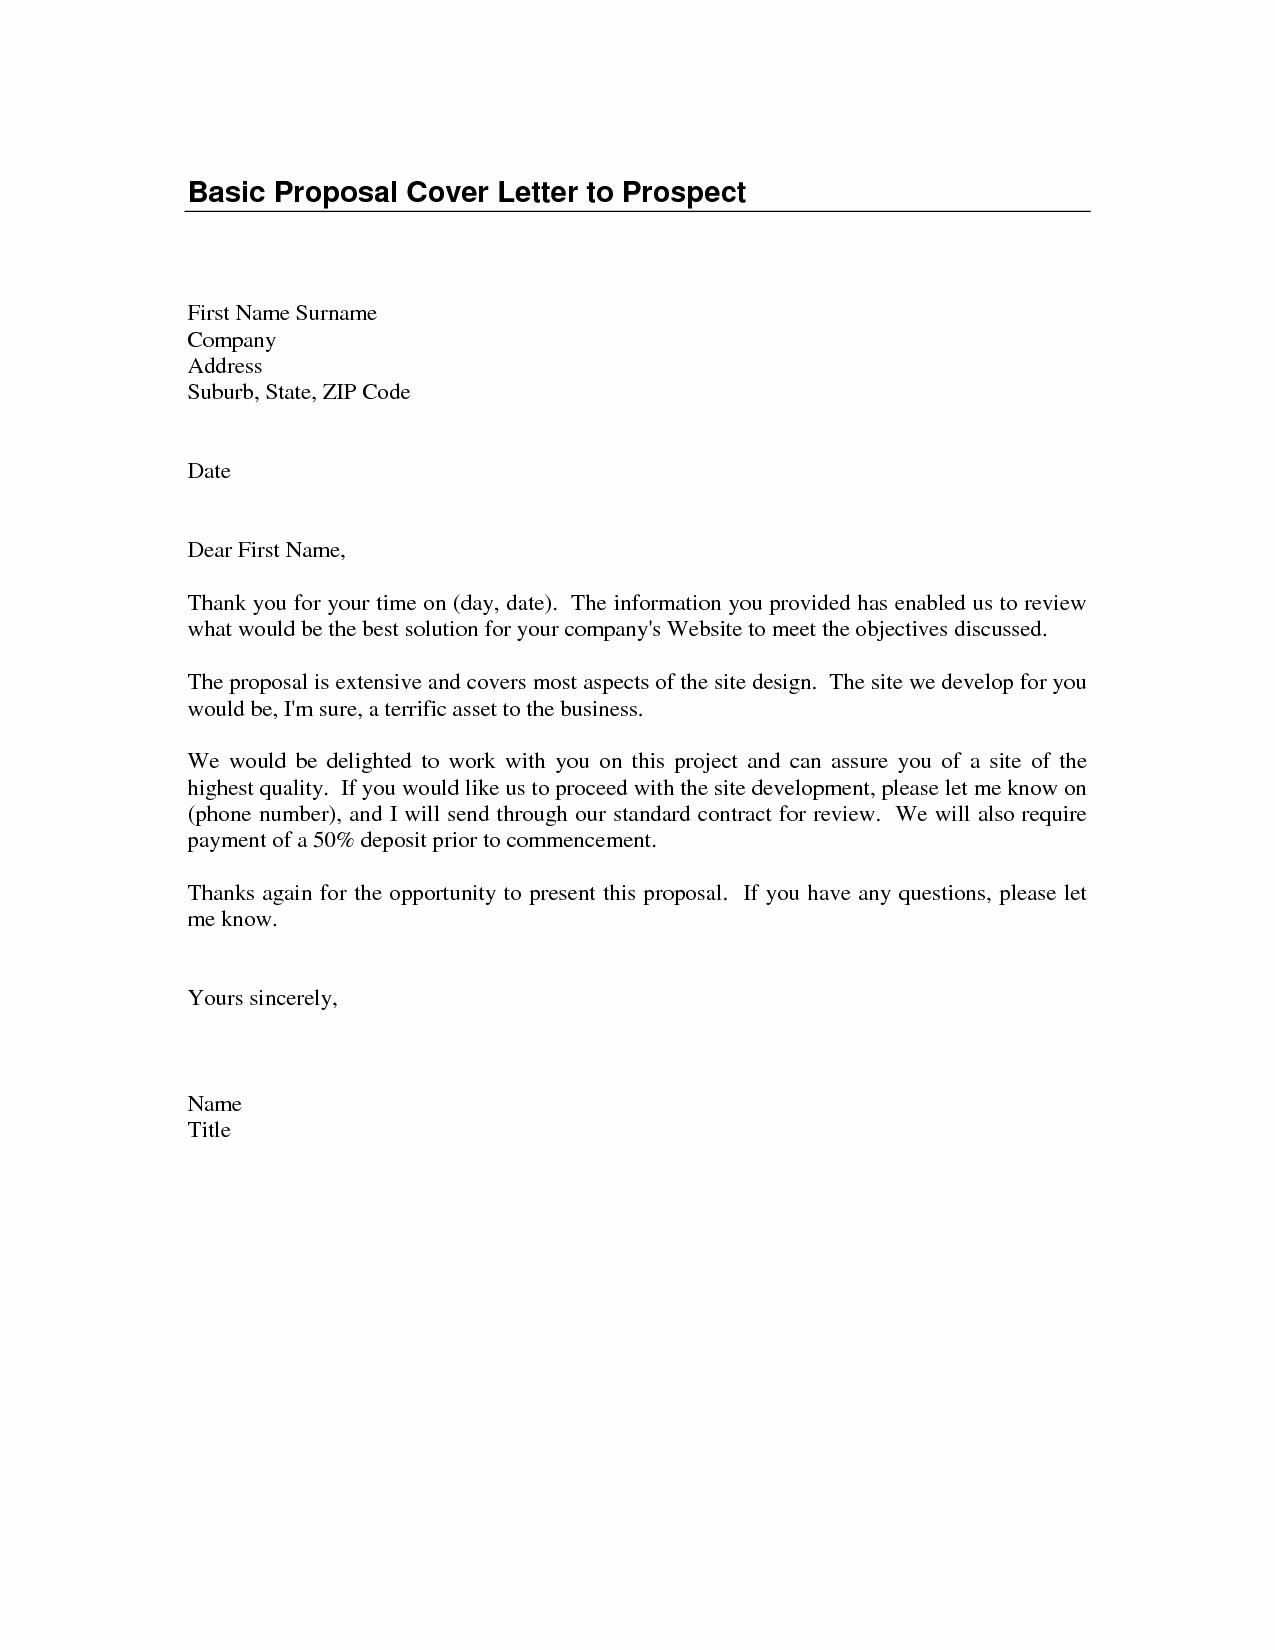 Basic Resume Cover Letter Examples Inspirational Basic Cover Letter Examples